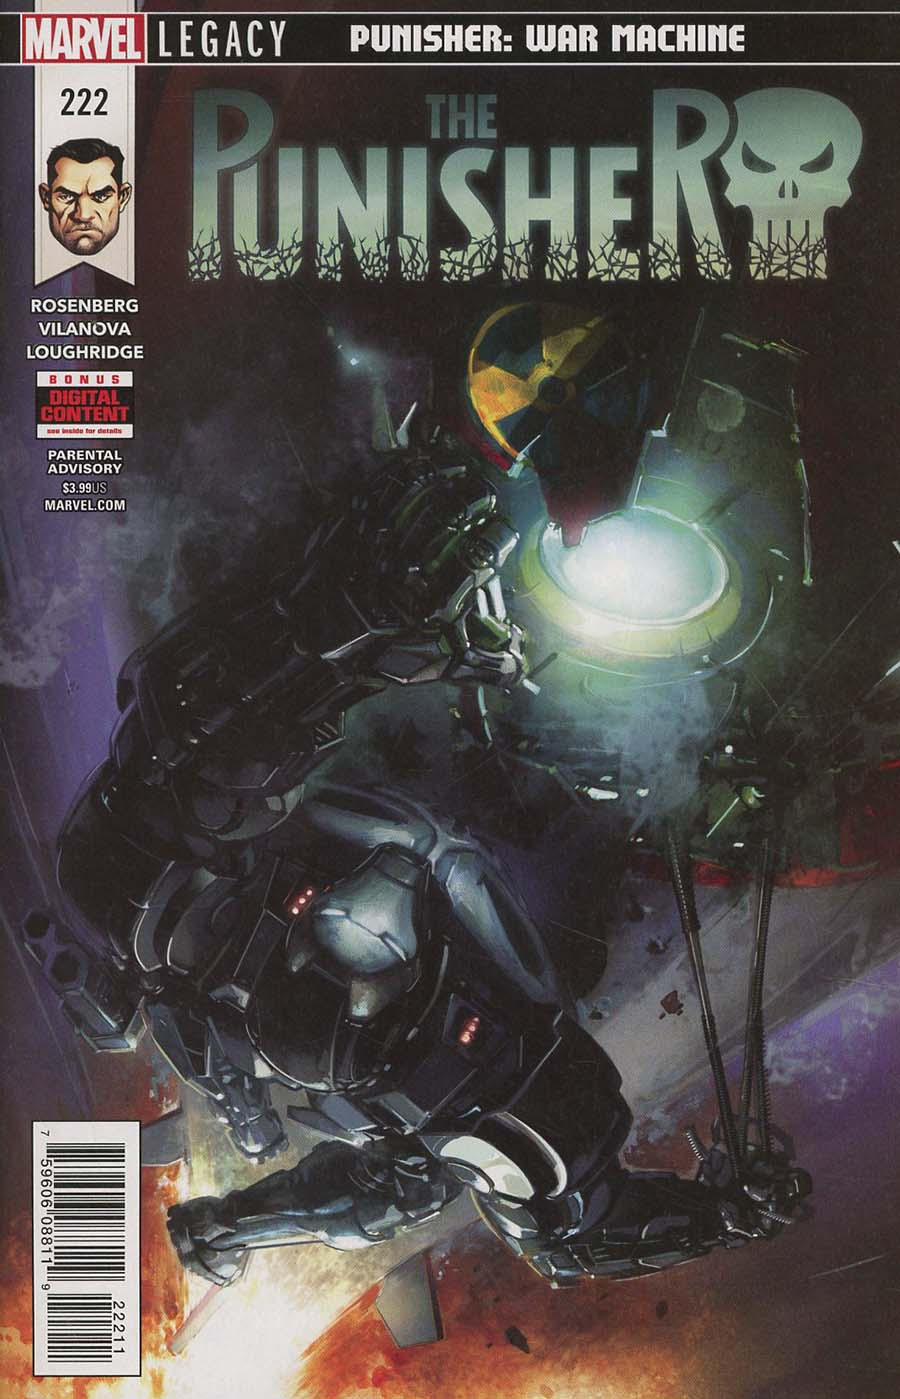 Punisher Vol 10 #222 (Marvel Legacy Tie-In)